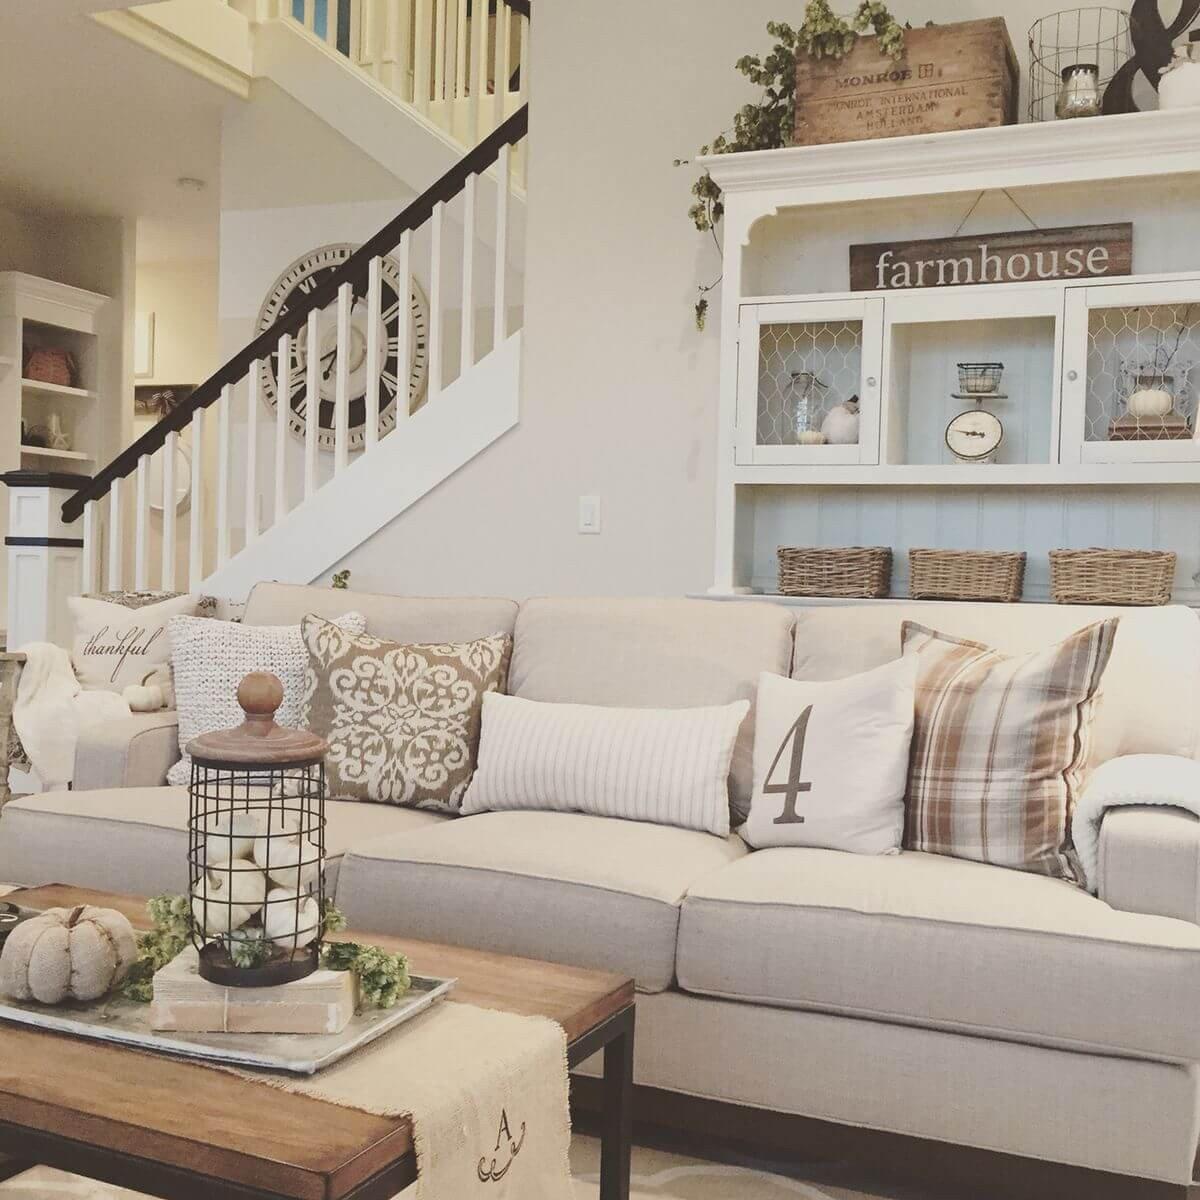 Small Farmhouse Living Room Ideas 35 Best Farmhouse Living Room Decor Ideas and Designs for 2017